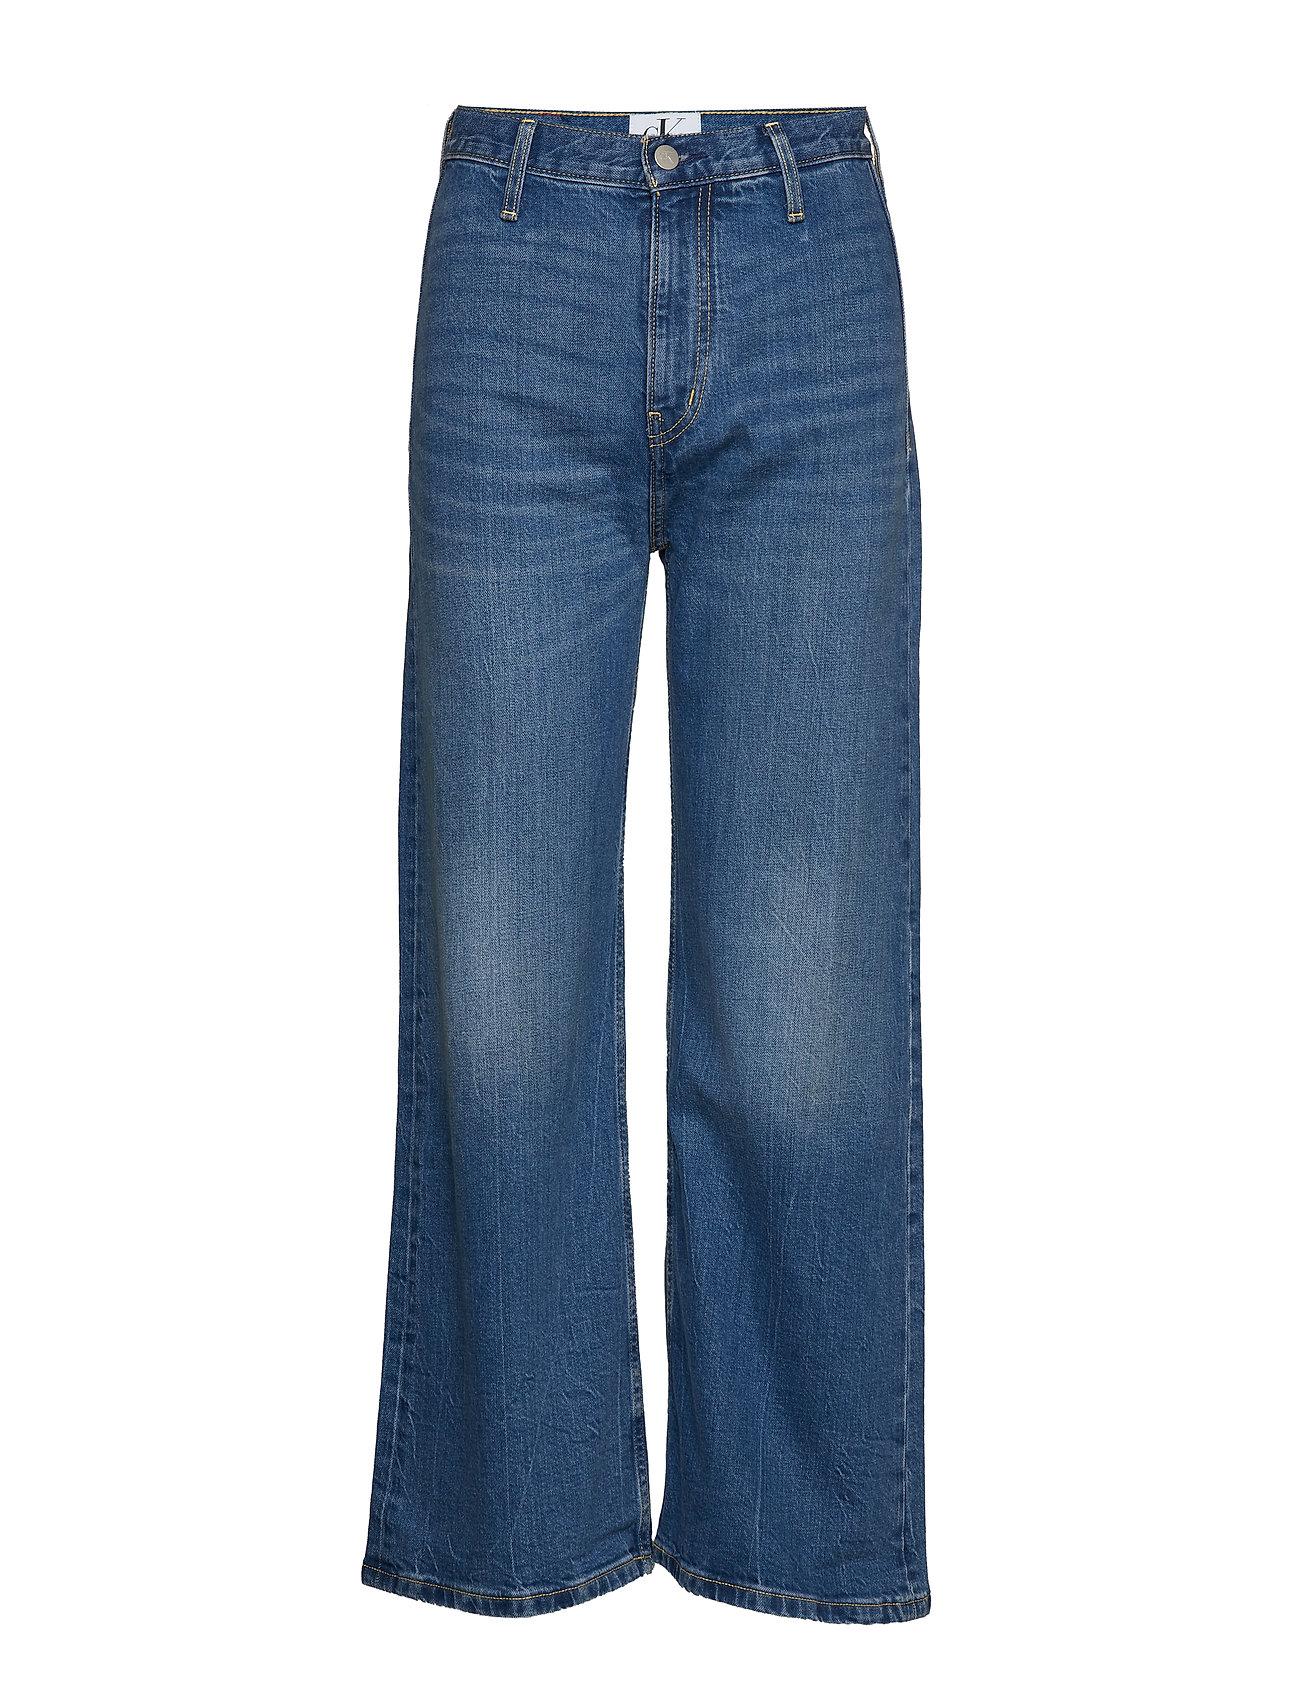 Calvin Klein Jeans WIDE LEG ANKLE - AA030 MID BLUE